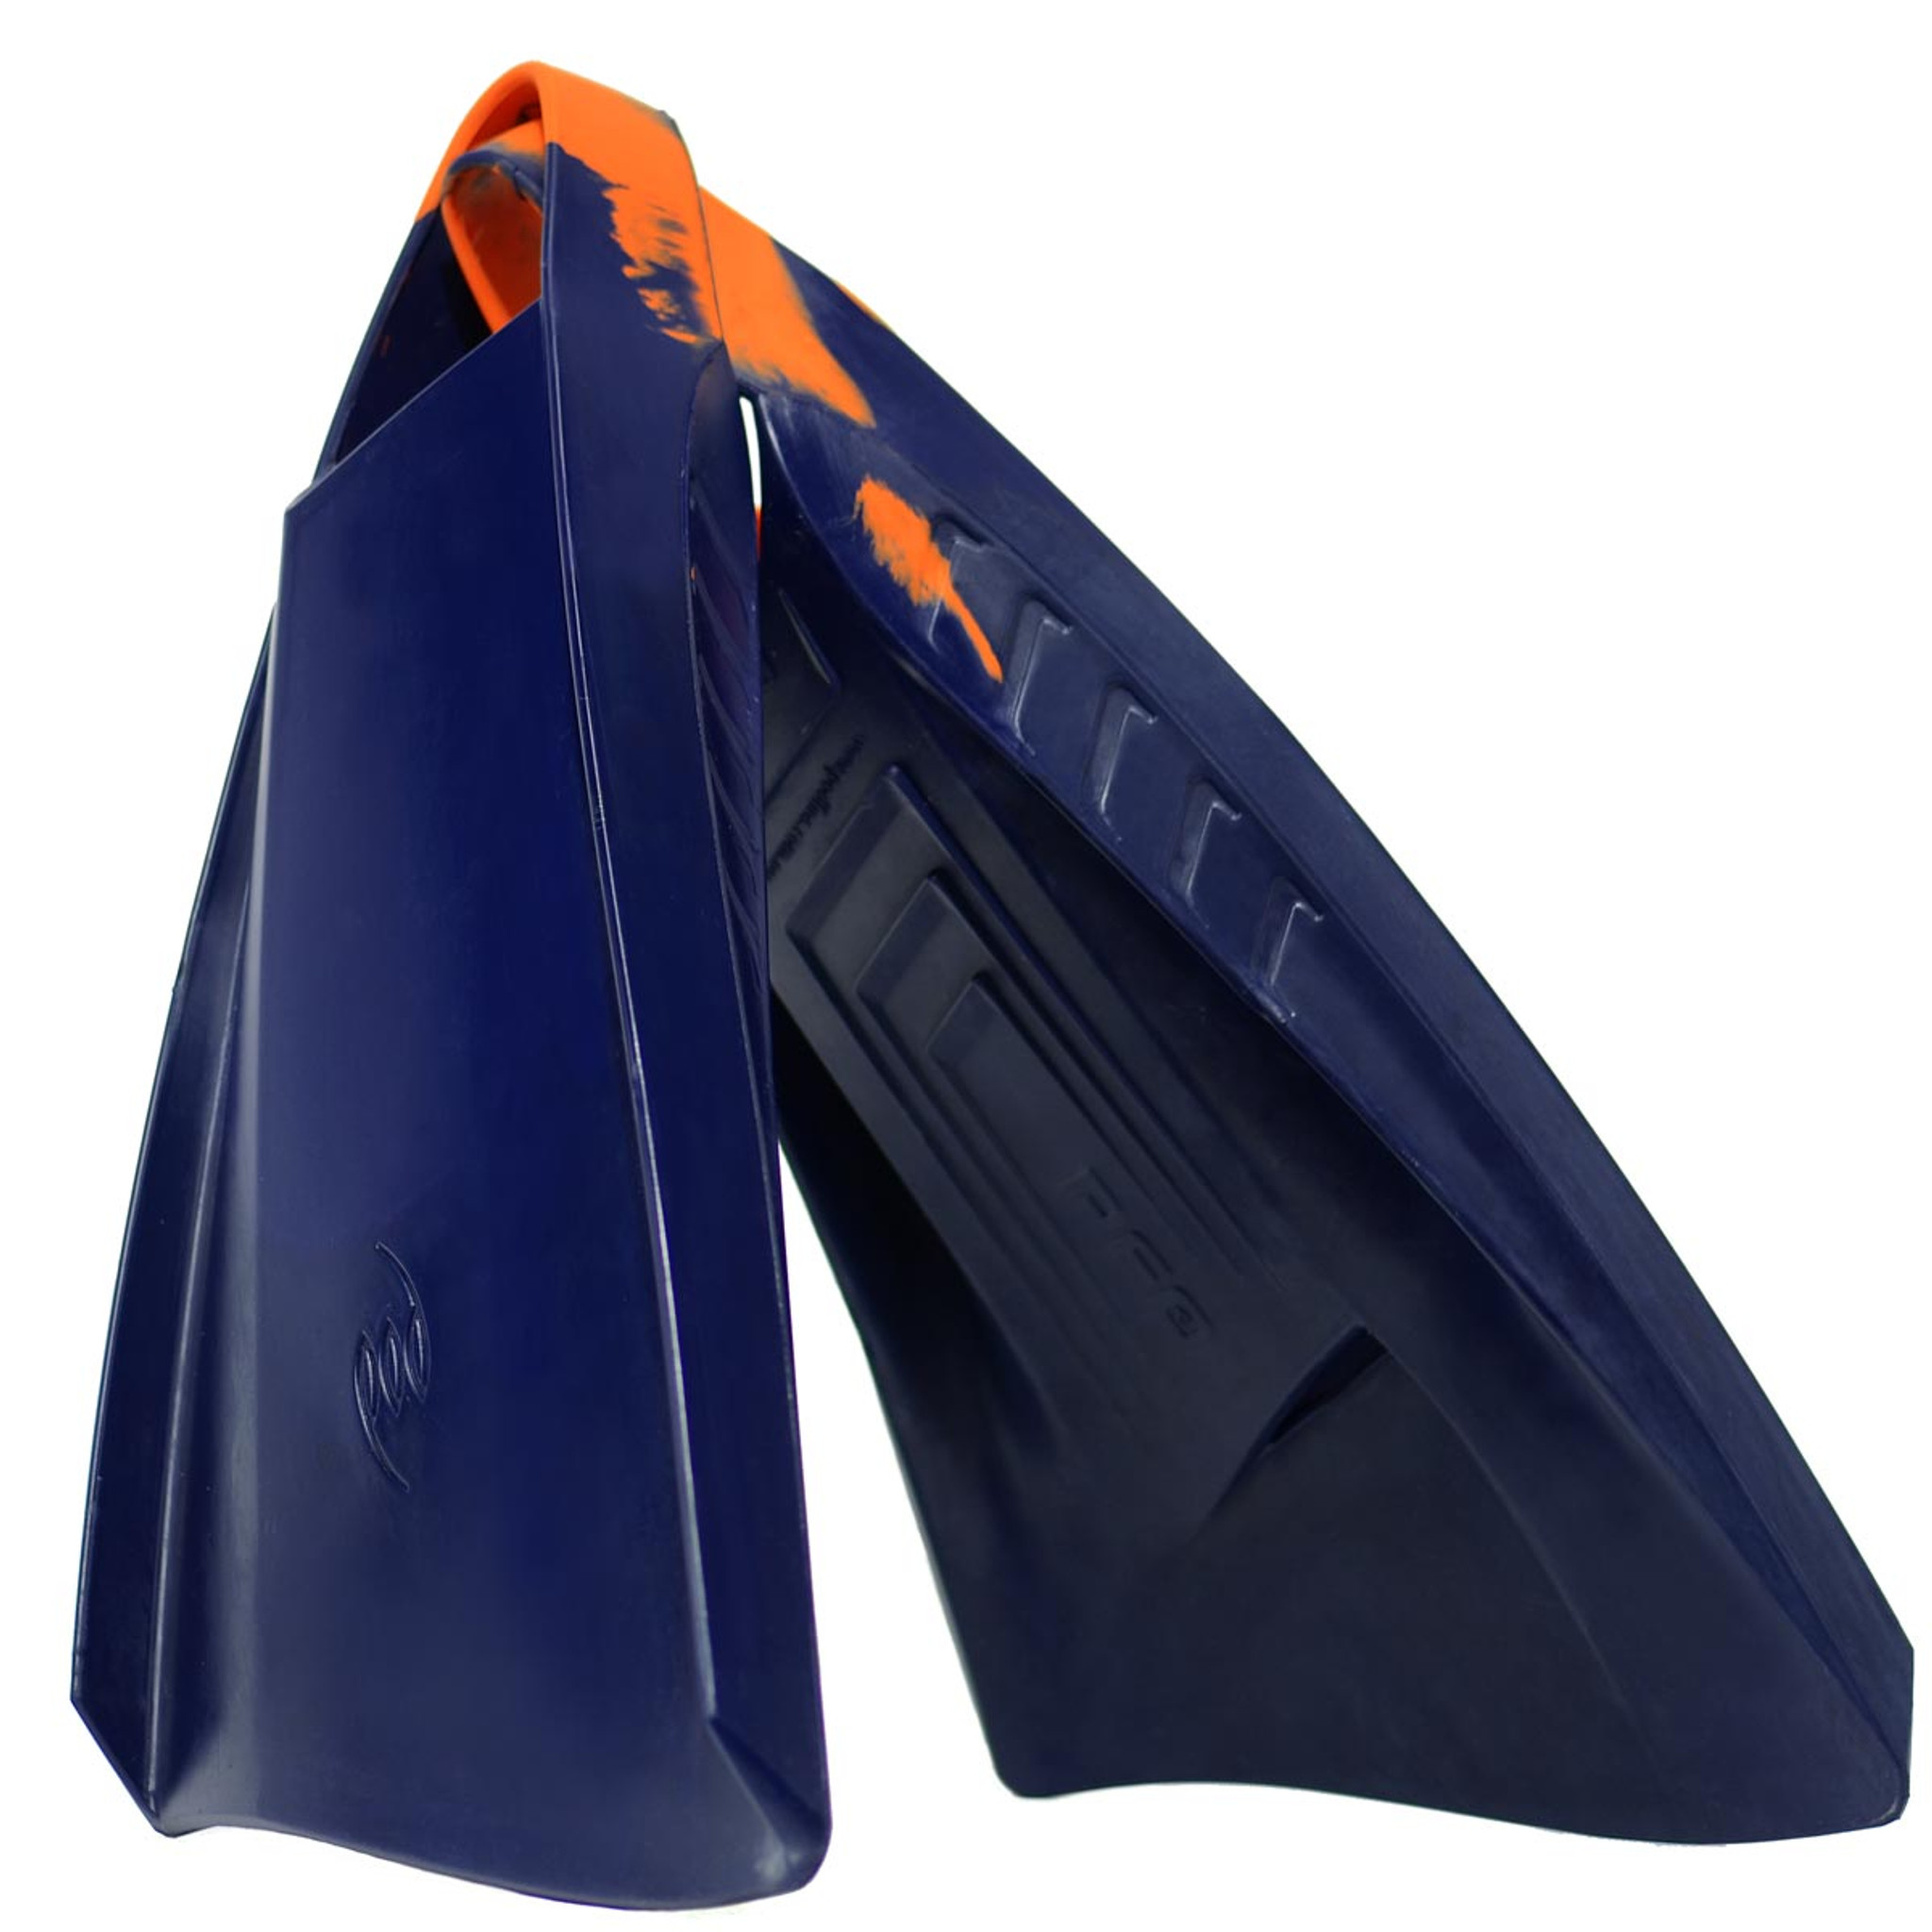 POD Fins PF3 Evolution - Bodysurfing - Bodyboarding Swim Fins